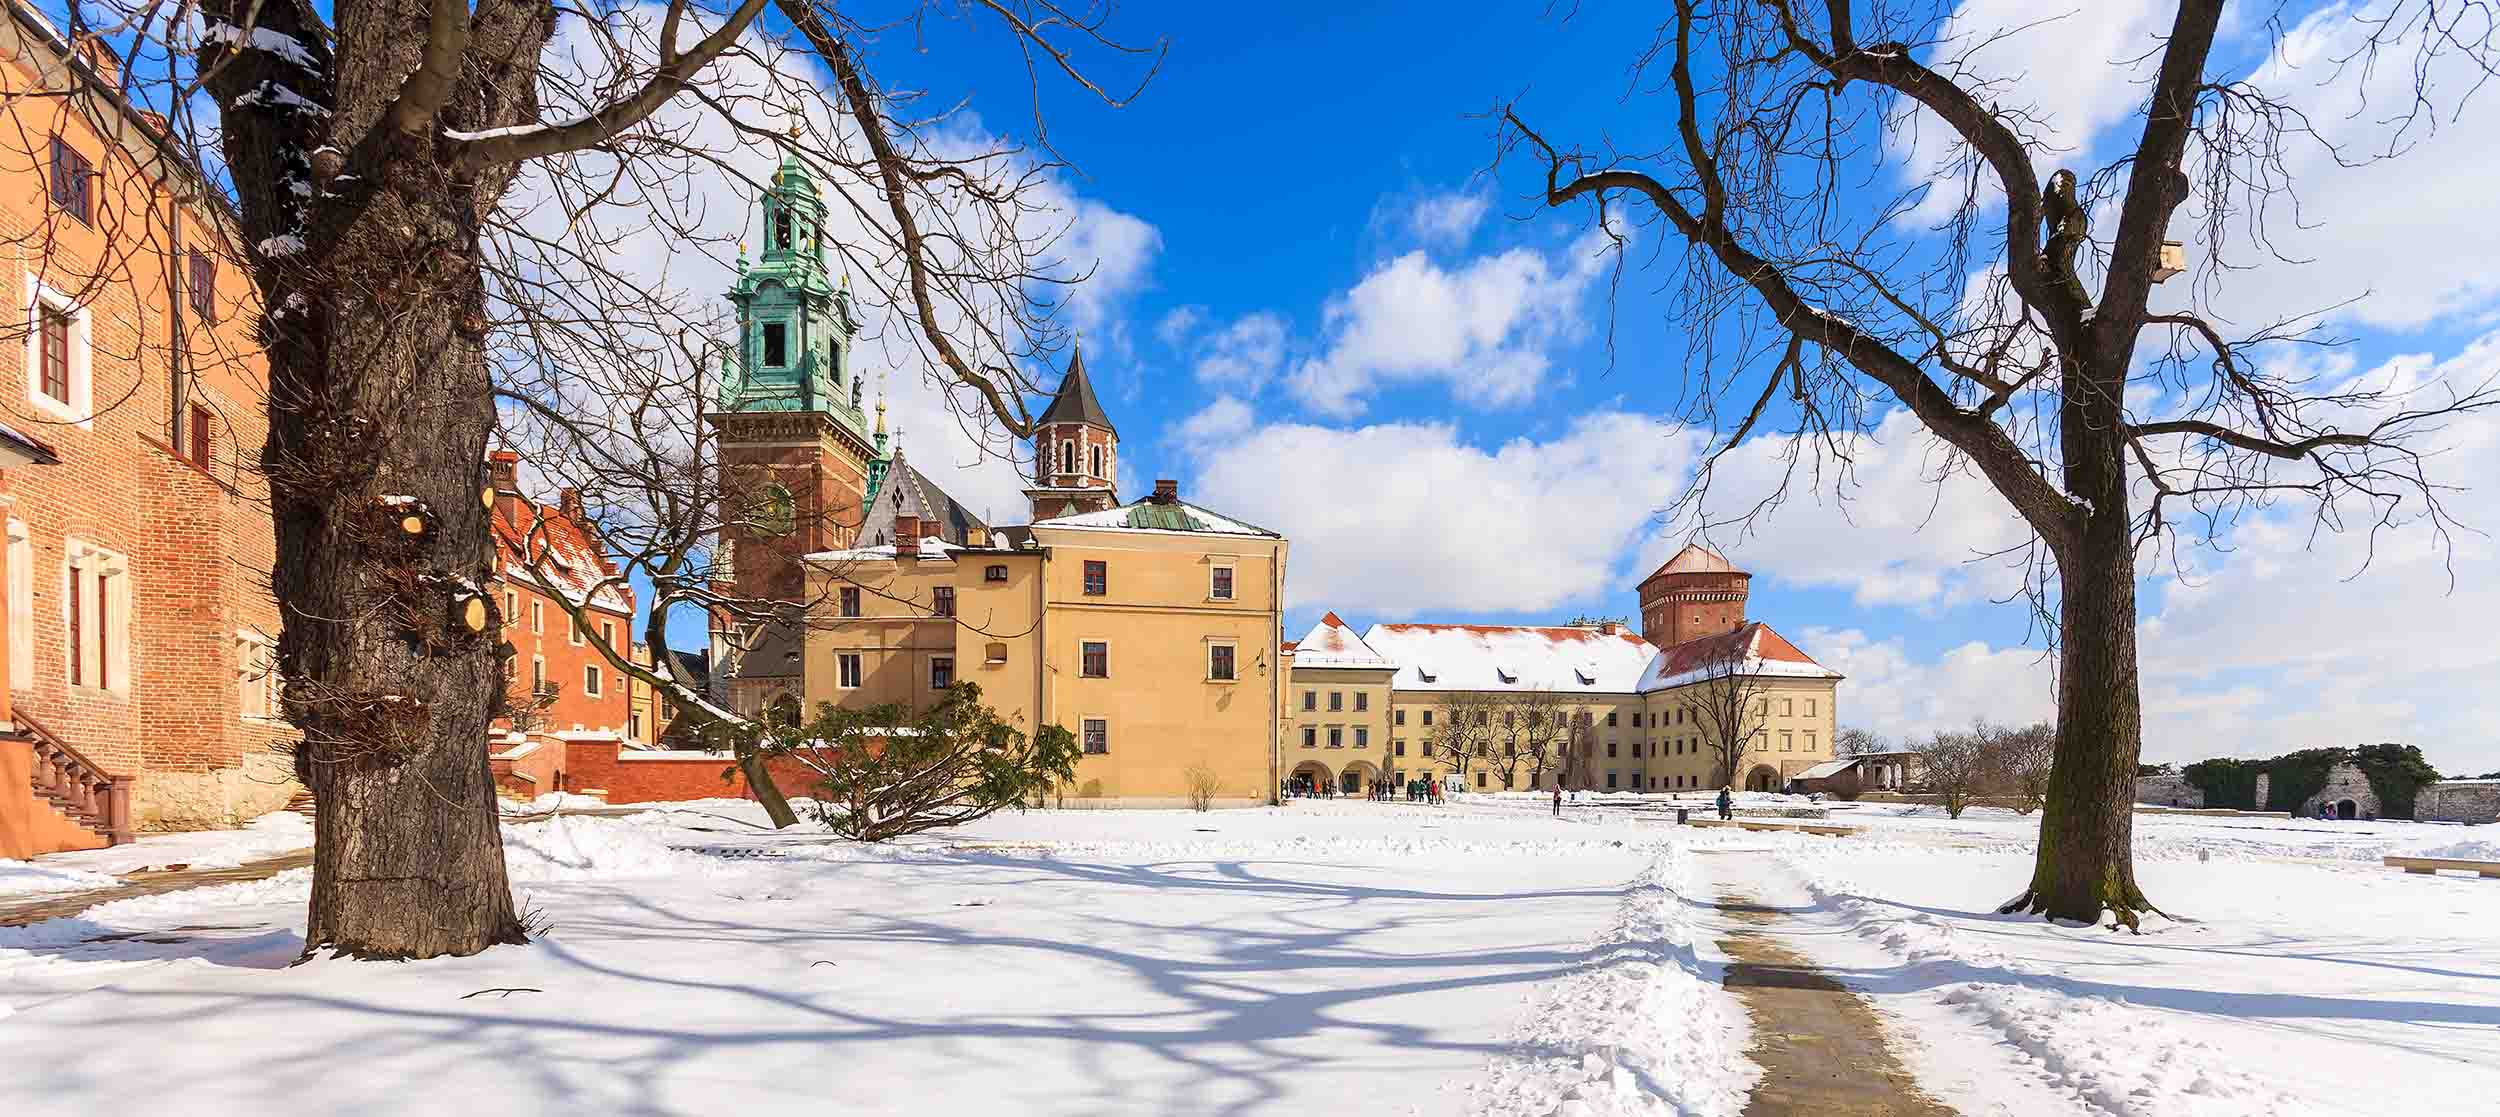 Snefald på nytårsaften i Krakow, Polen